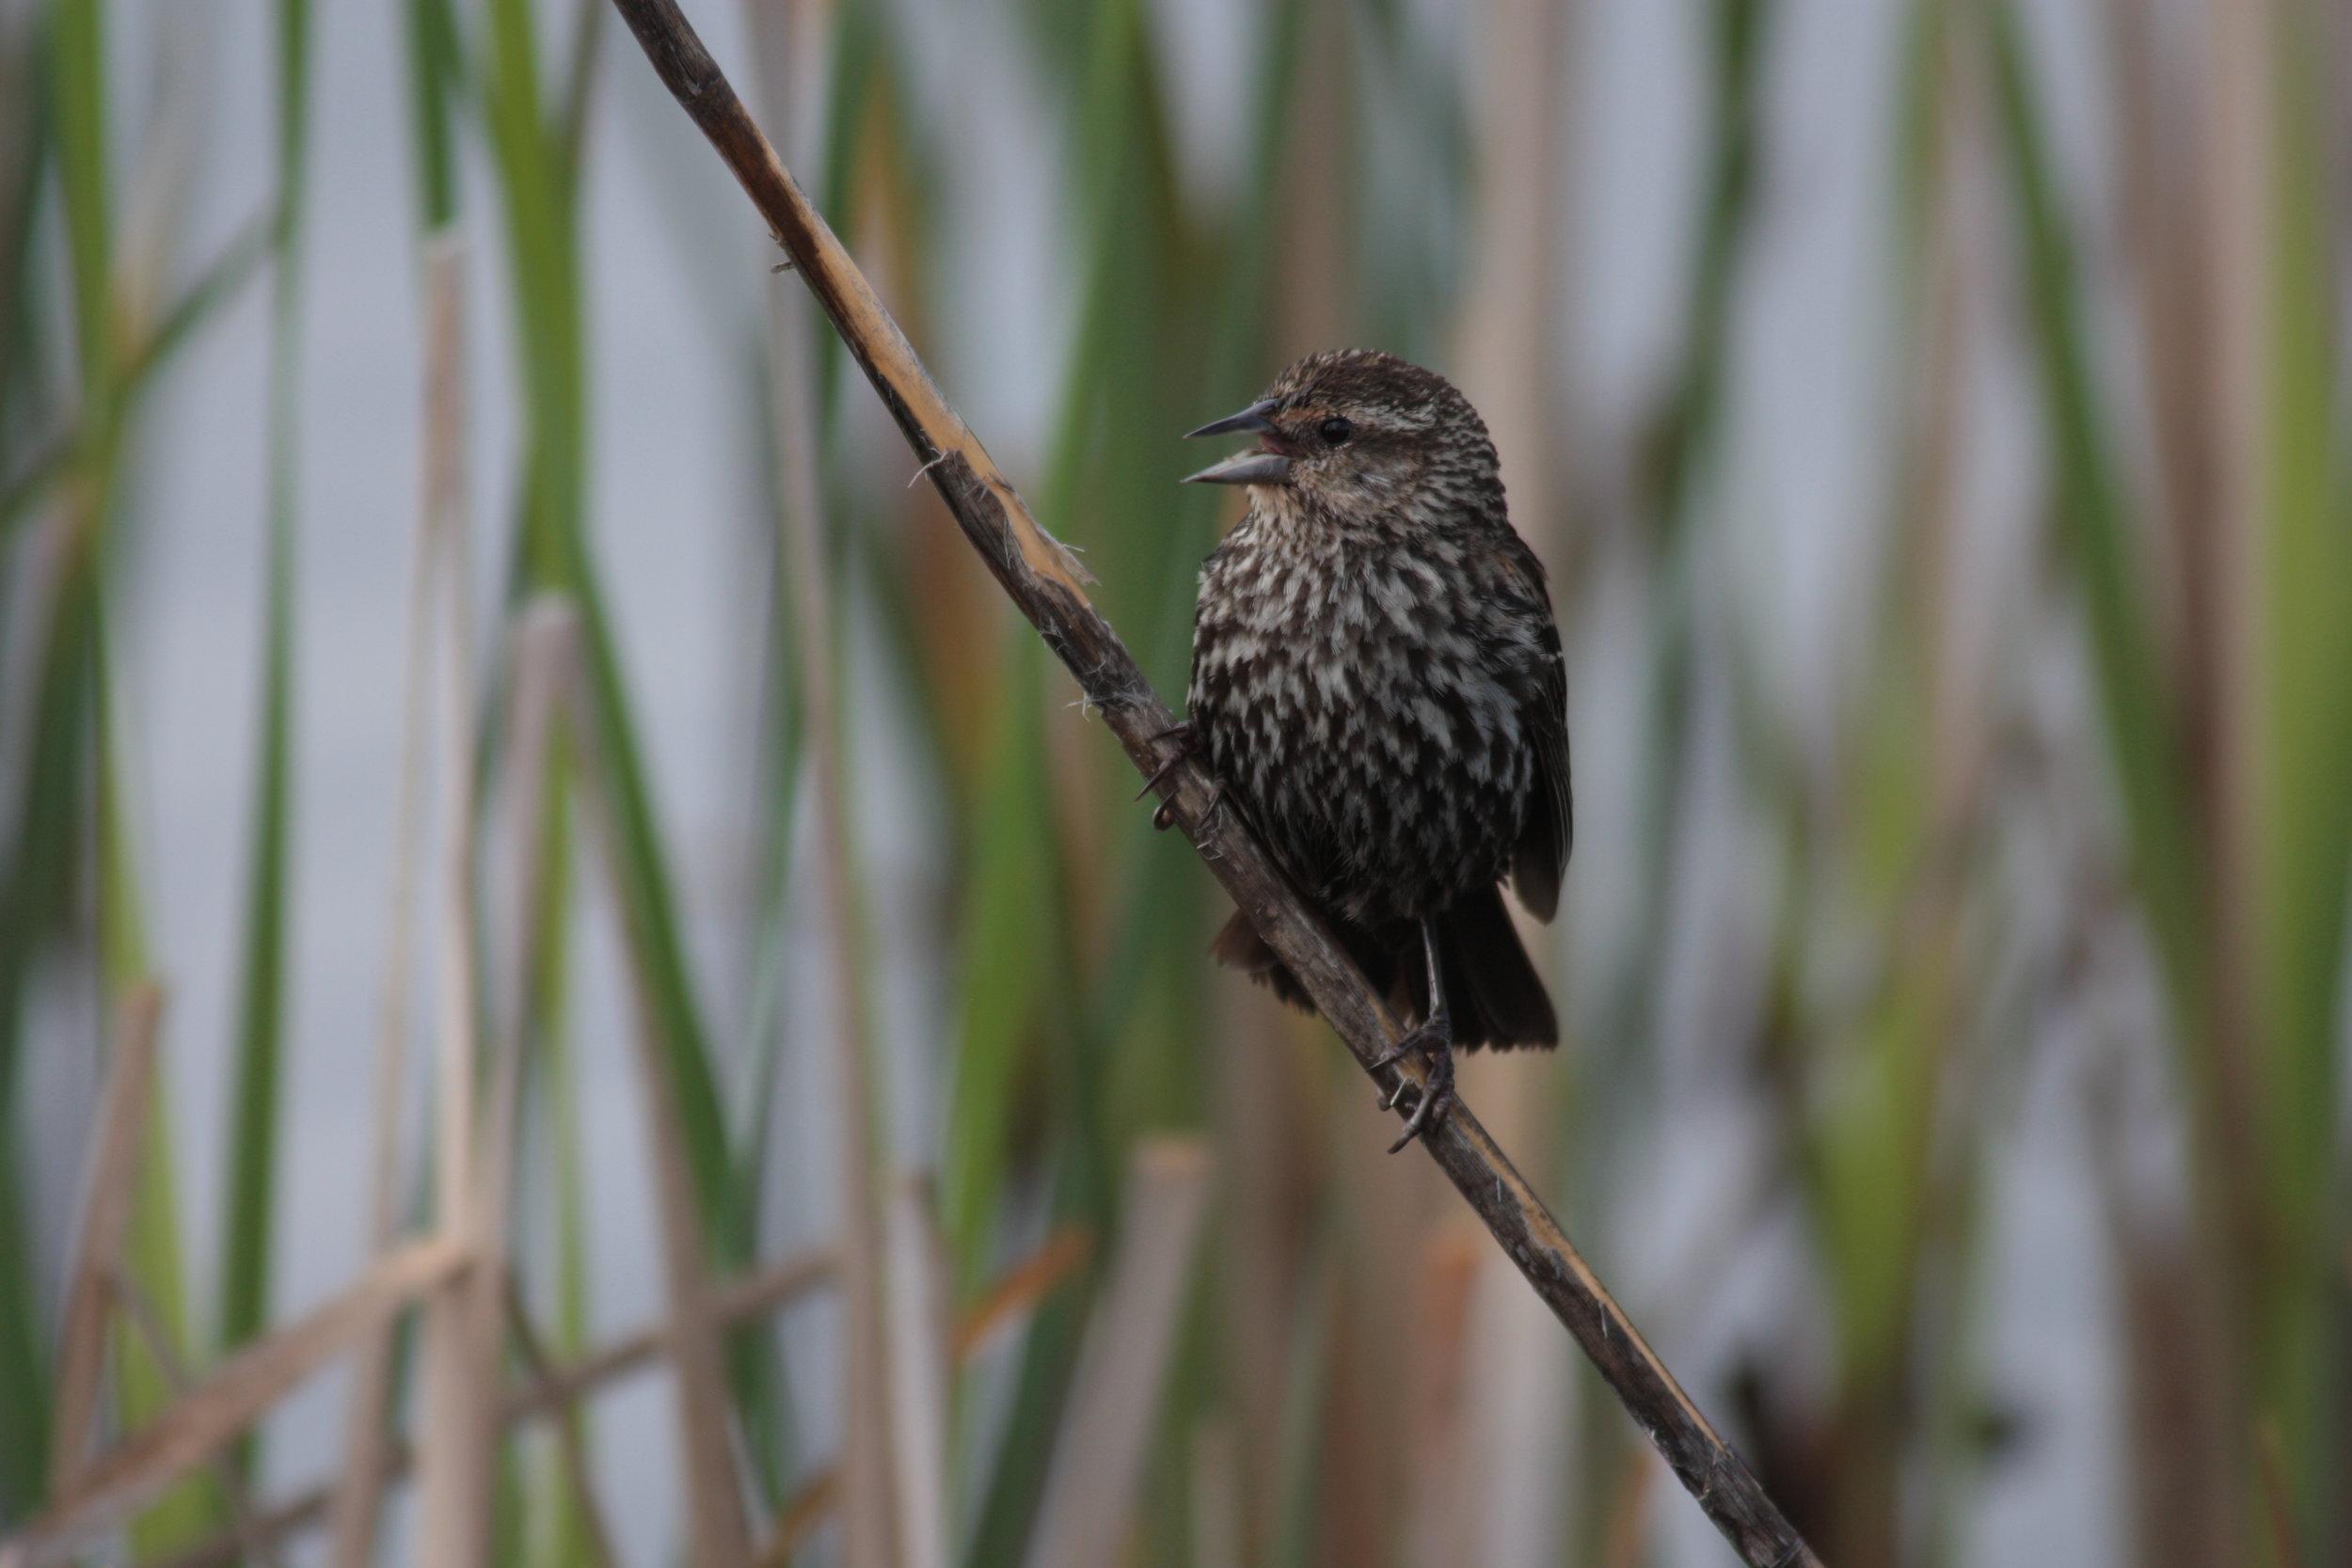 red-winged-blackbird-agelaius-phoeniceus_25966277122_o.jpg